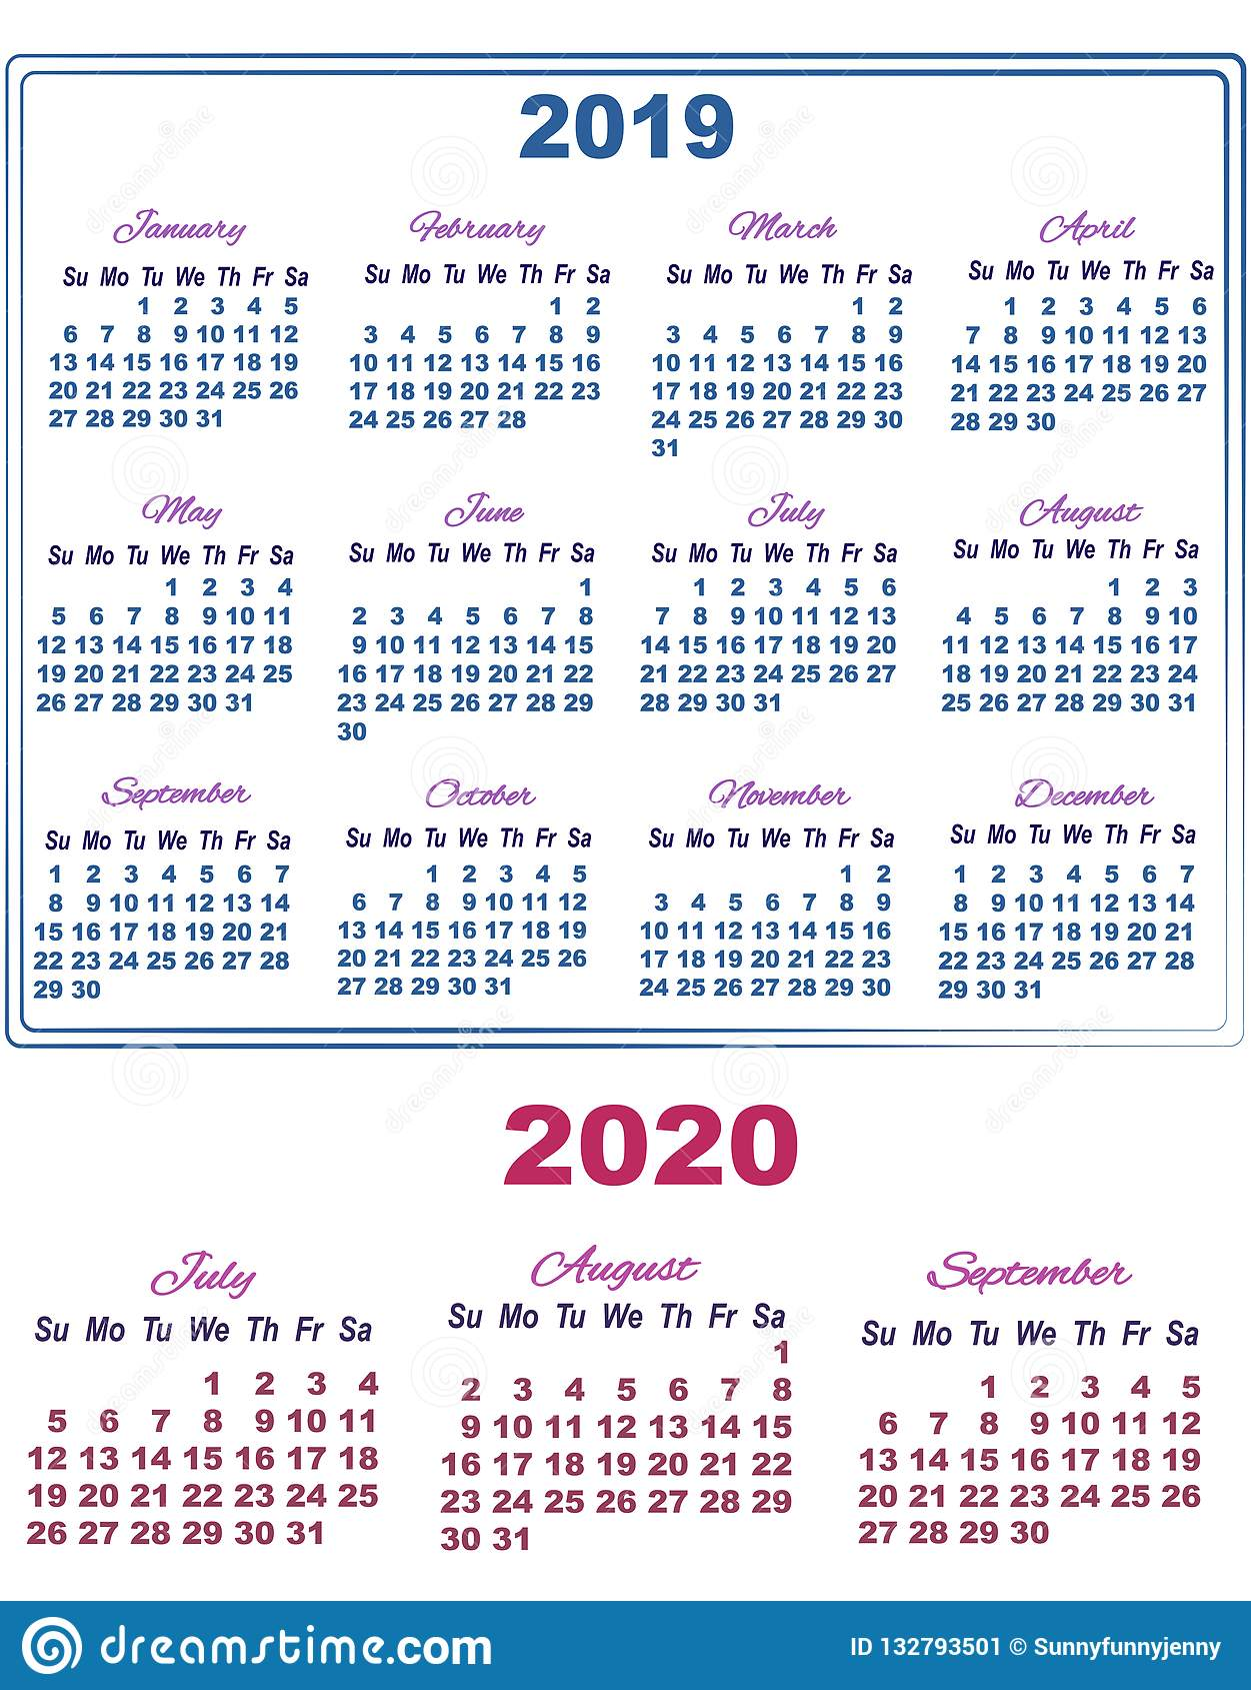 Calendario Luglio Agosto 2020.Calendario Luglio Agosto 2020 Calendario 2020